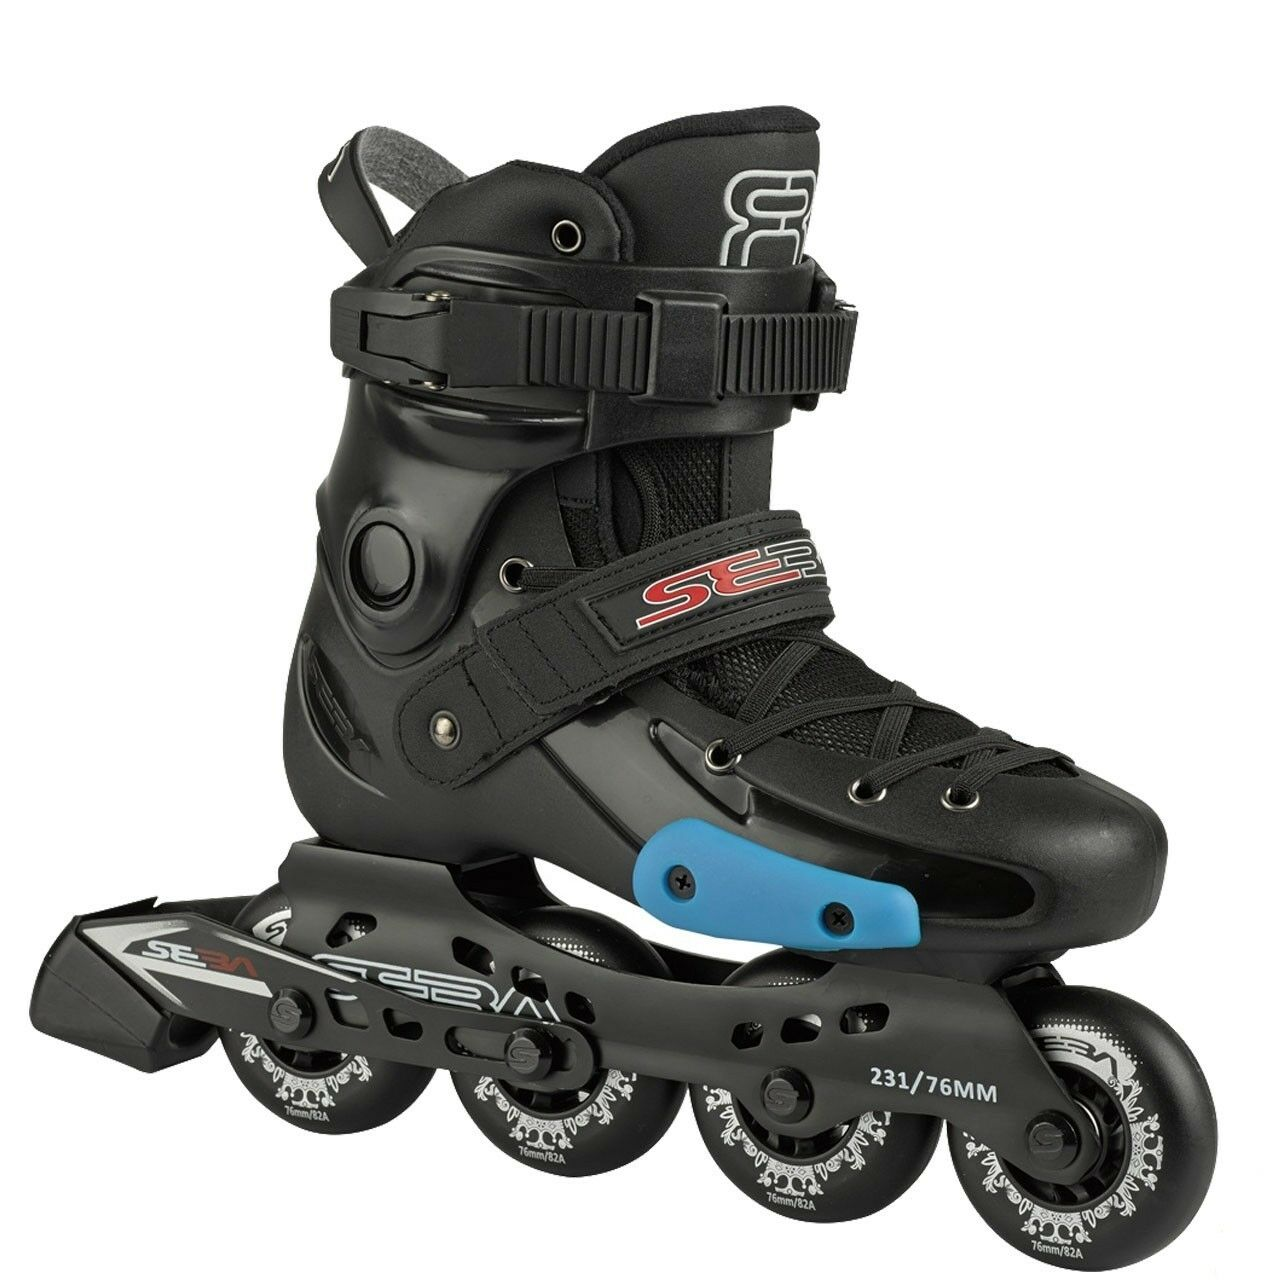 Seba FR Junior Adjustable  In-Line Skates